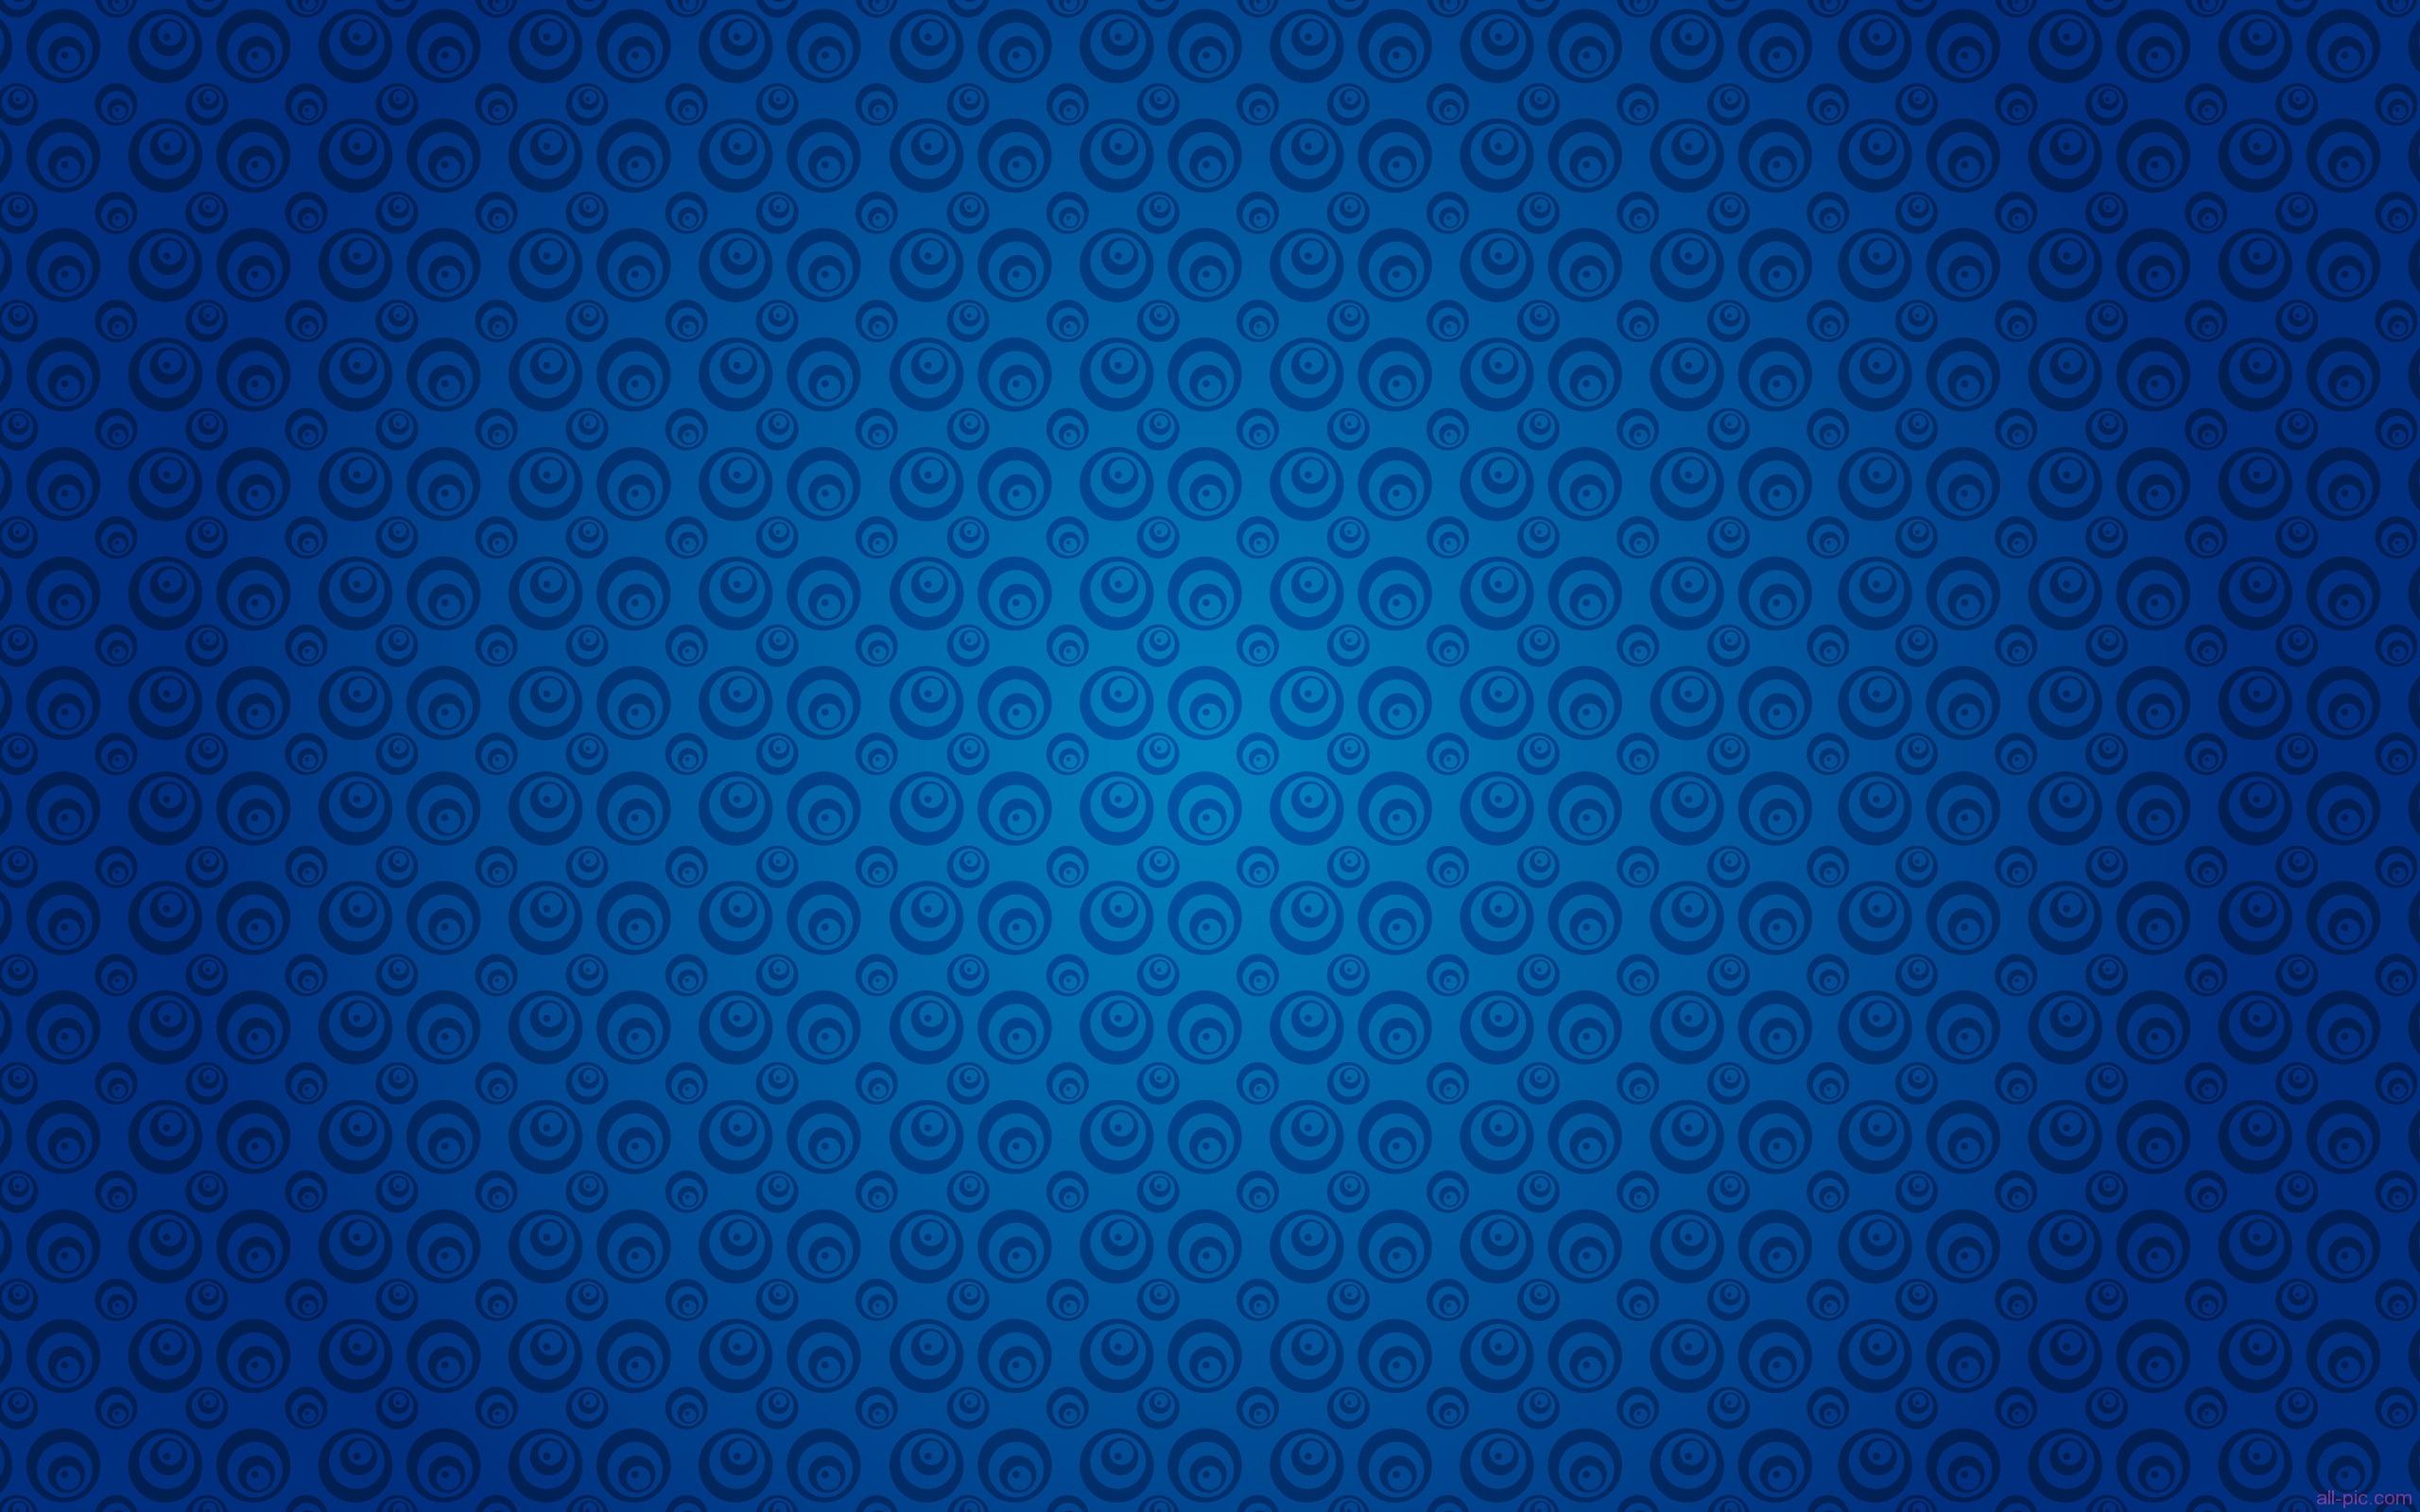 1680x816px Background Images For Websites Blur Shine | #300141